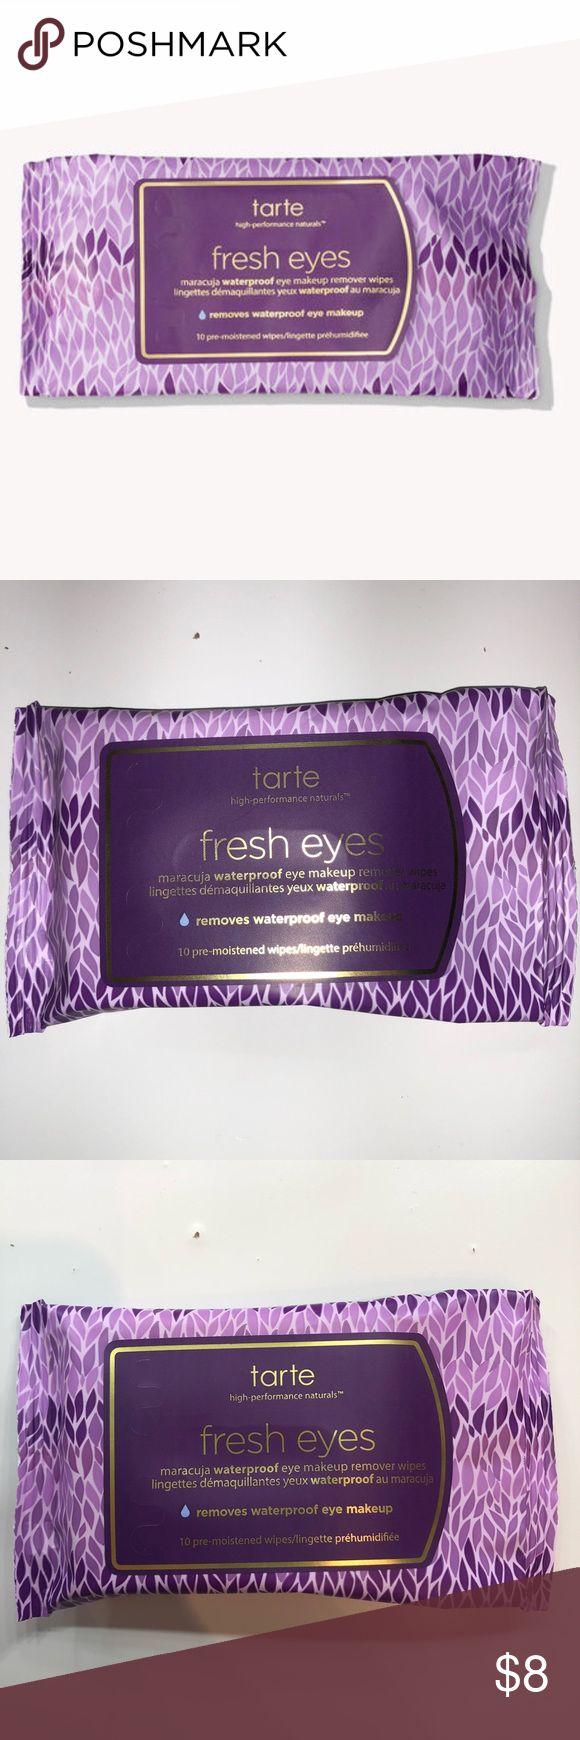 Tarte Fresh Eyes Makeup Remover Brand new! Makeup Remover